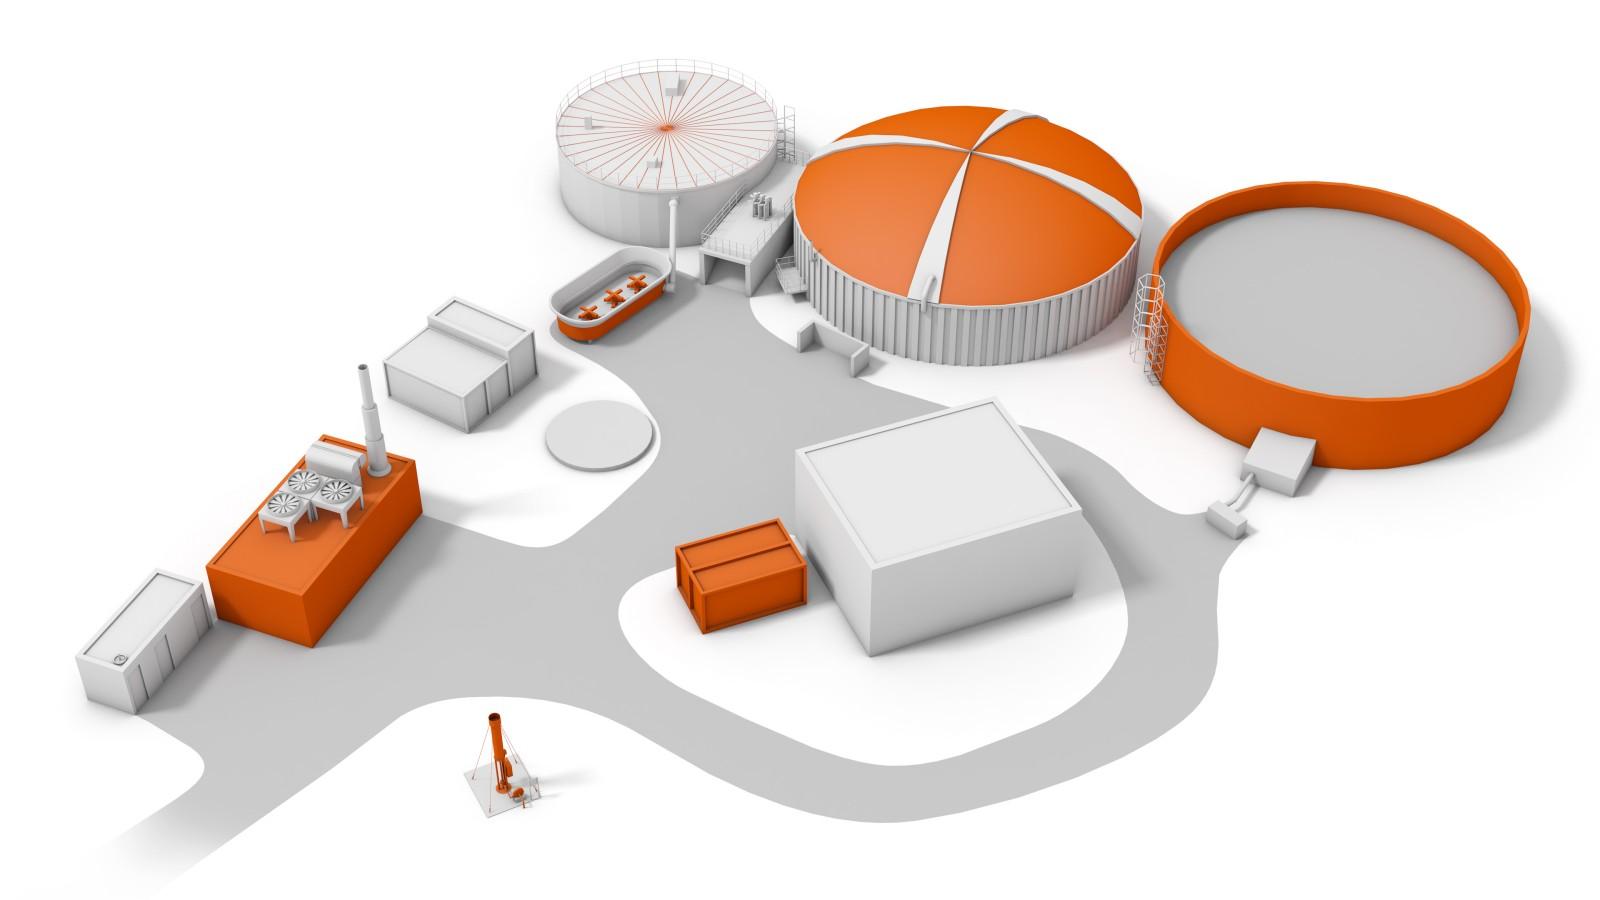 Ez Virtual Tour Biogas Power Station Ov Plant Diagram Aerial View Of The